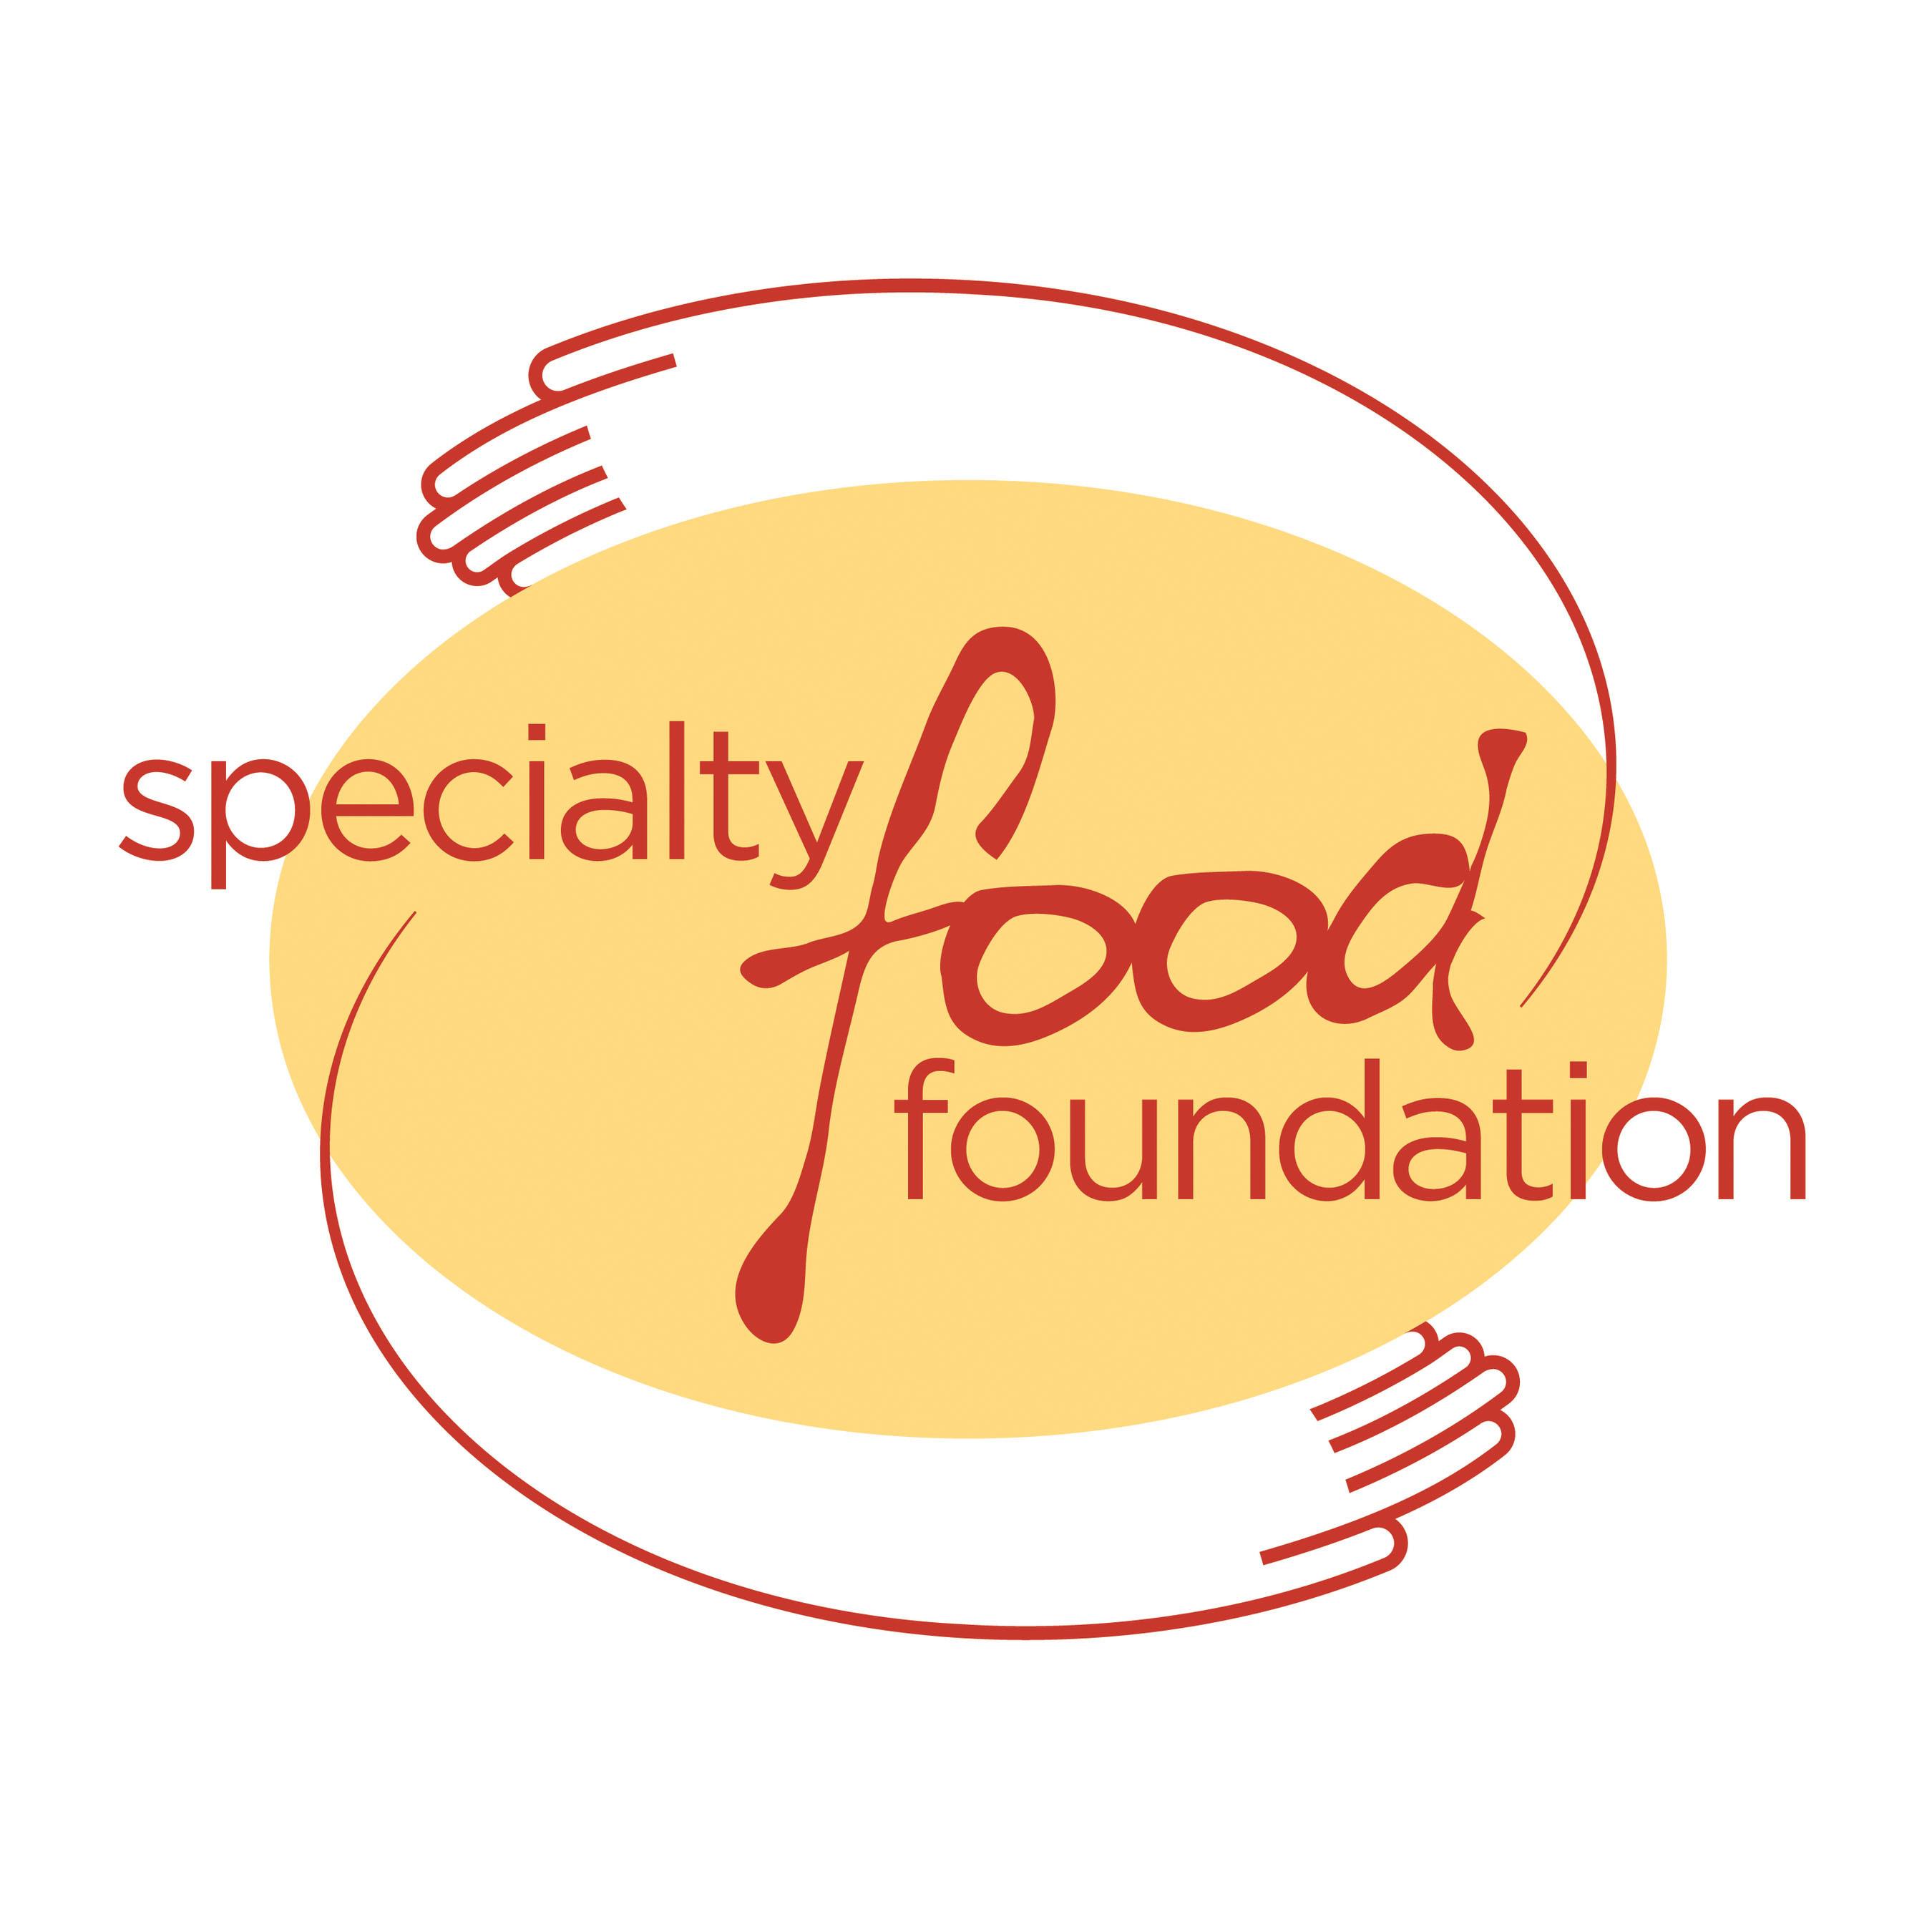 Specialty Food Foundation logo